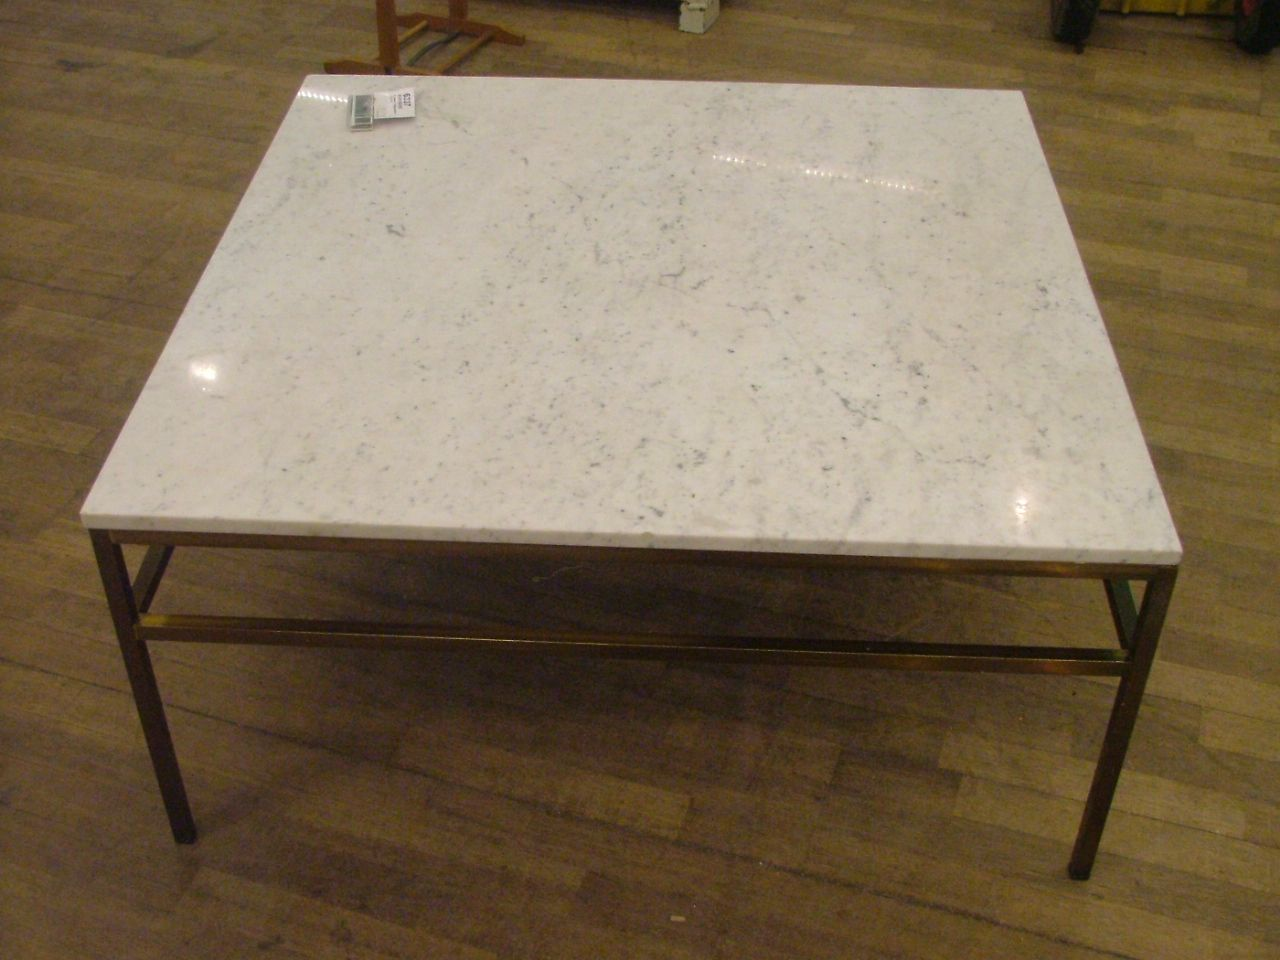 soffbord englesson m ssing marmor 100x100 353 6337 metropol auktioner. Black Bedroom Furniture Sets. Home Design Ideas